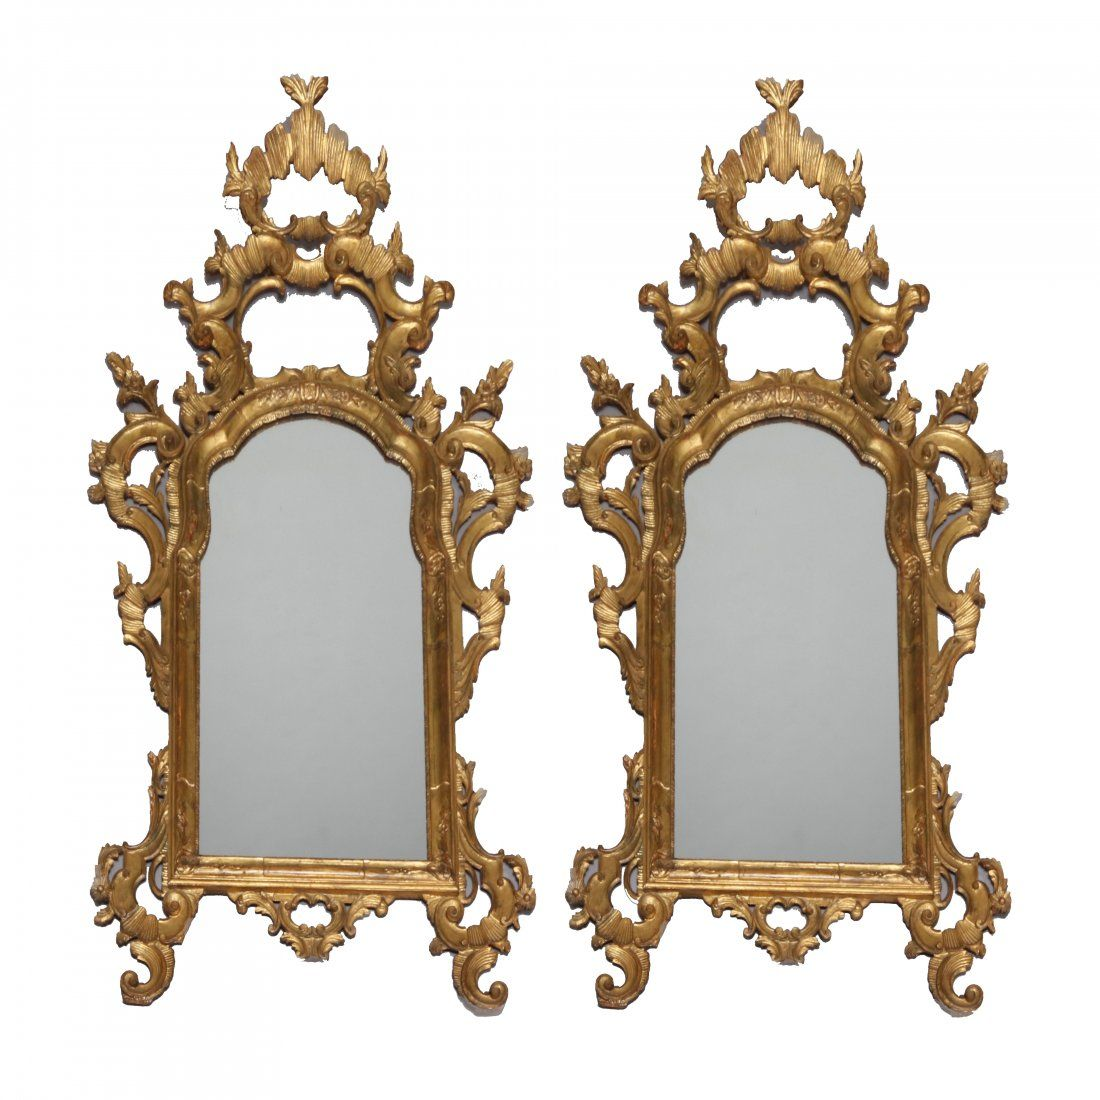 Monumental Antique Italian 18th C Baroque Wall Mirrors